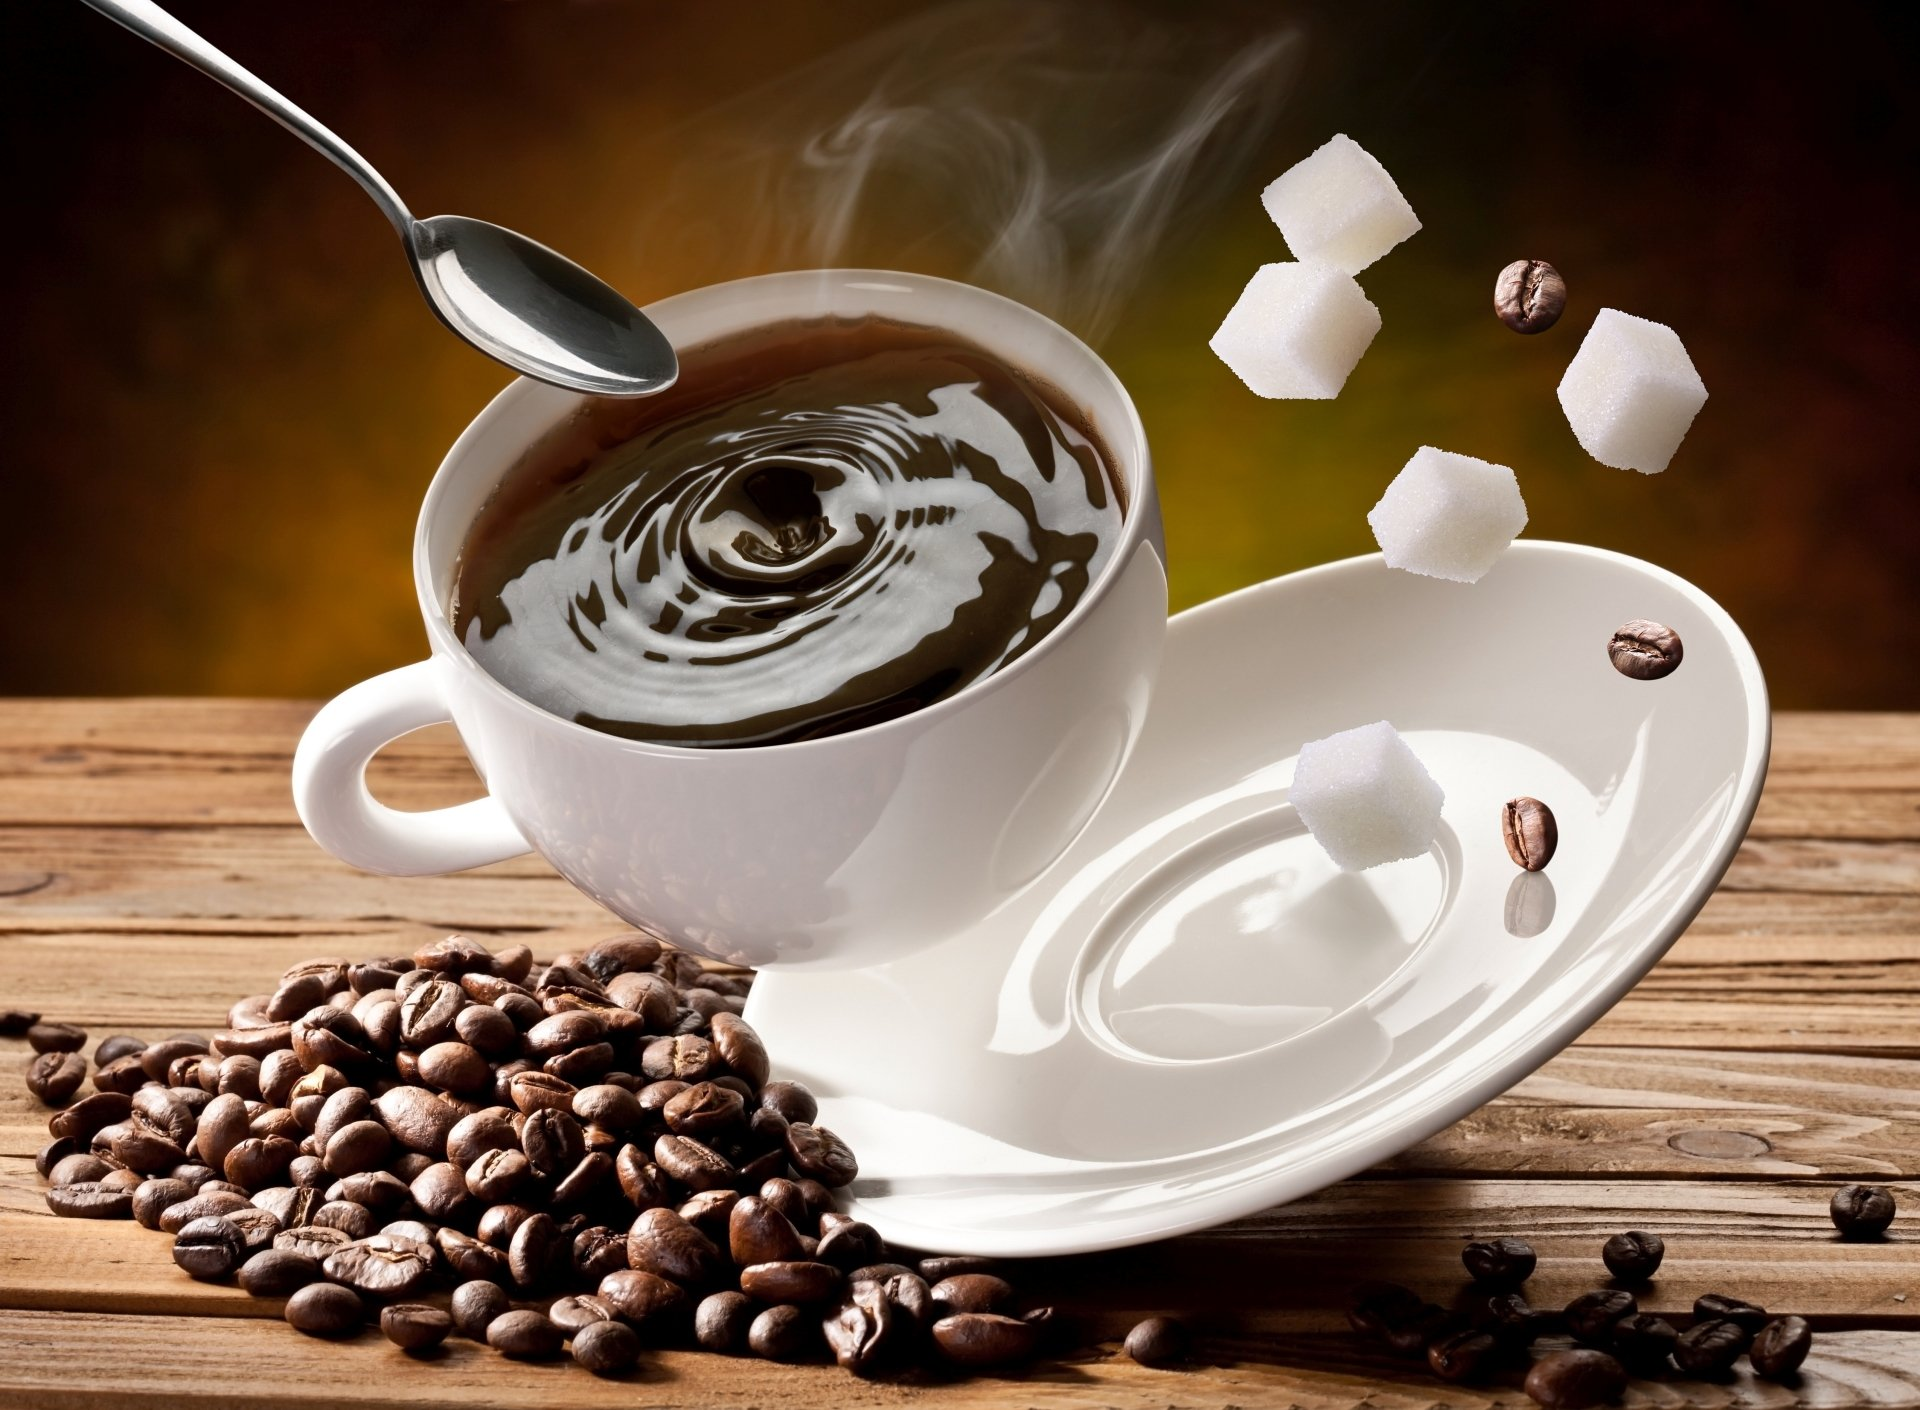 Food - Coffee  Cup Sugar Coffee Beans Spoon Wallpaper